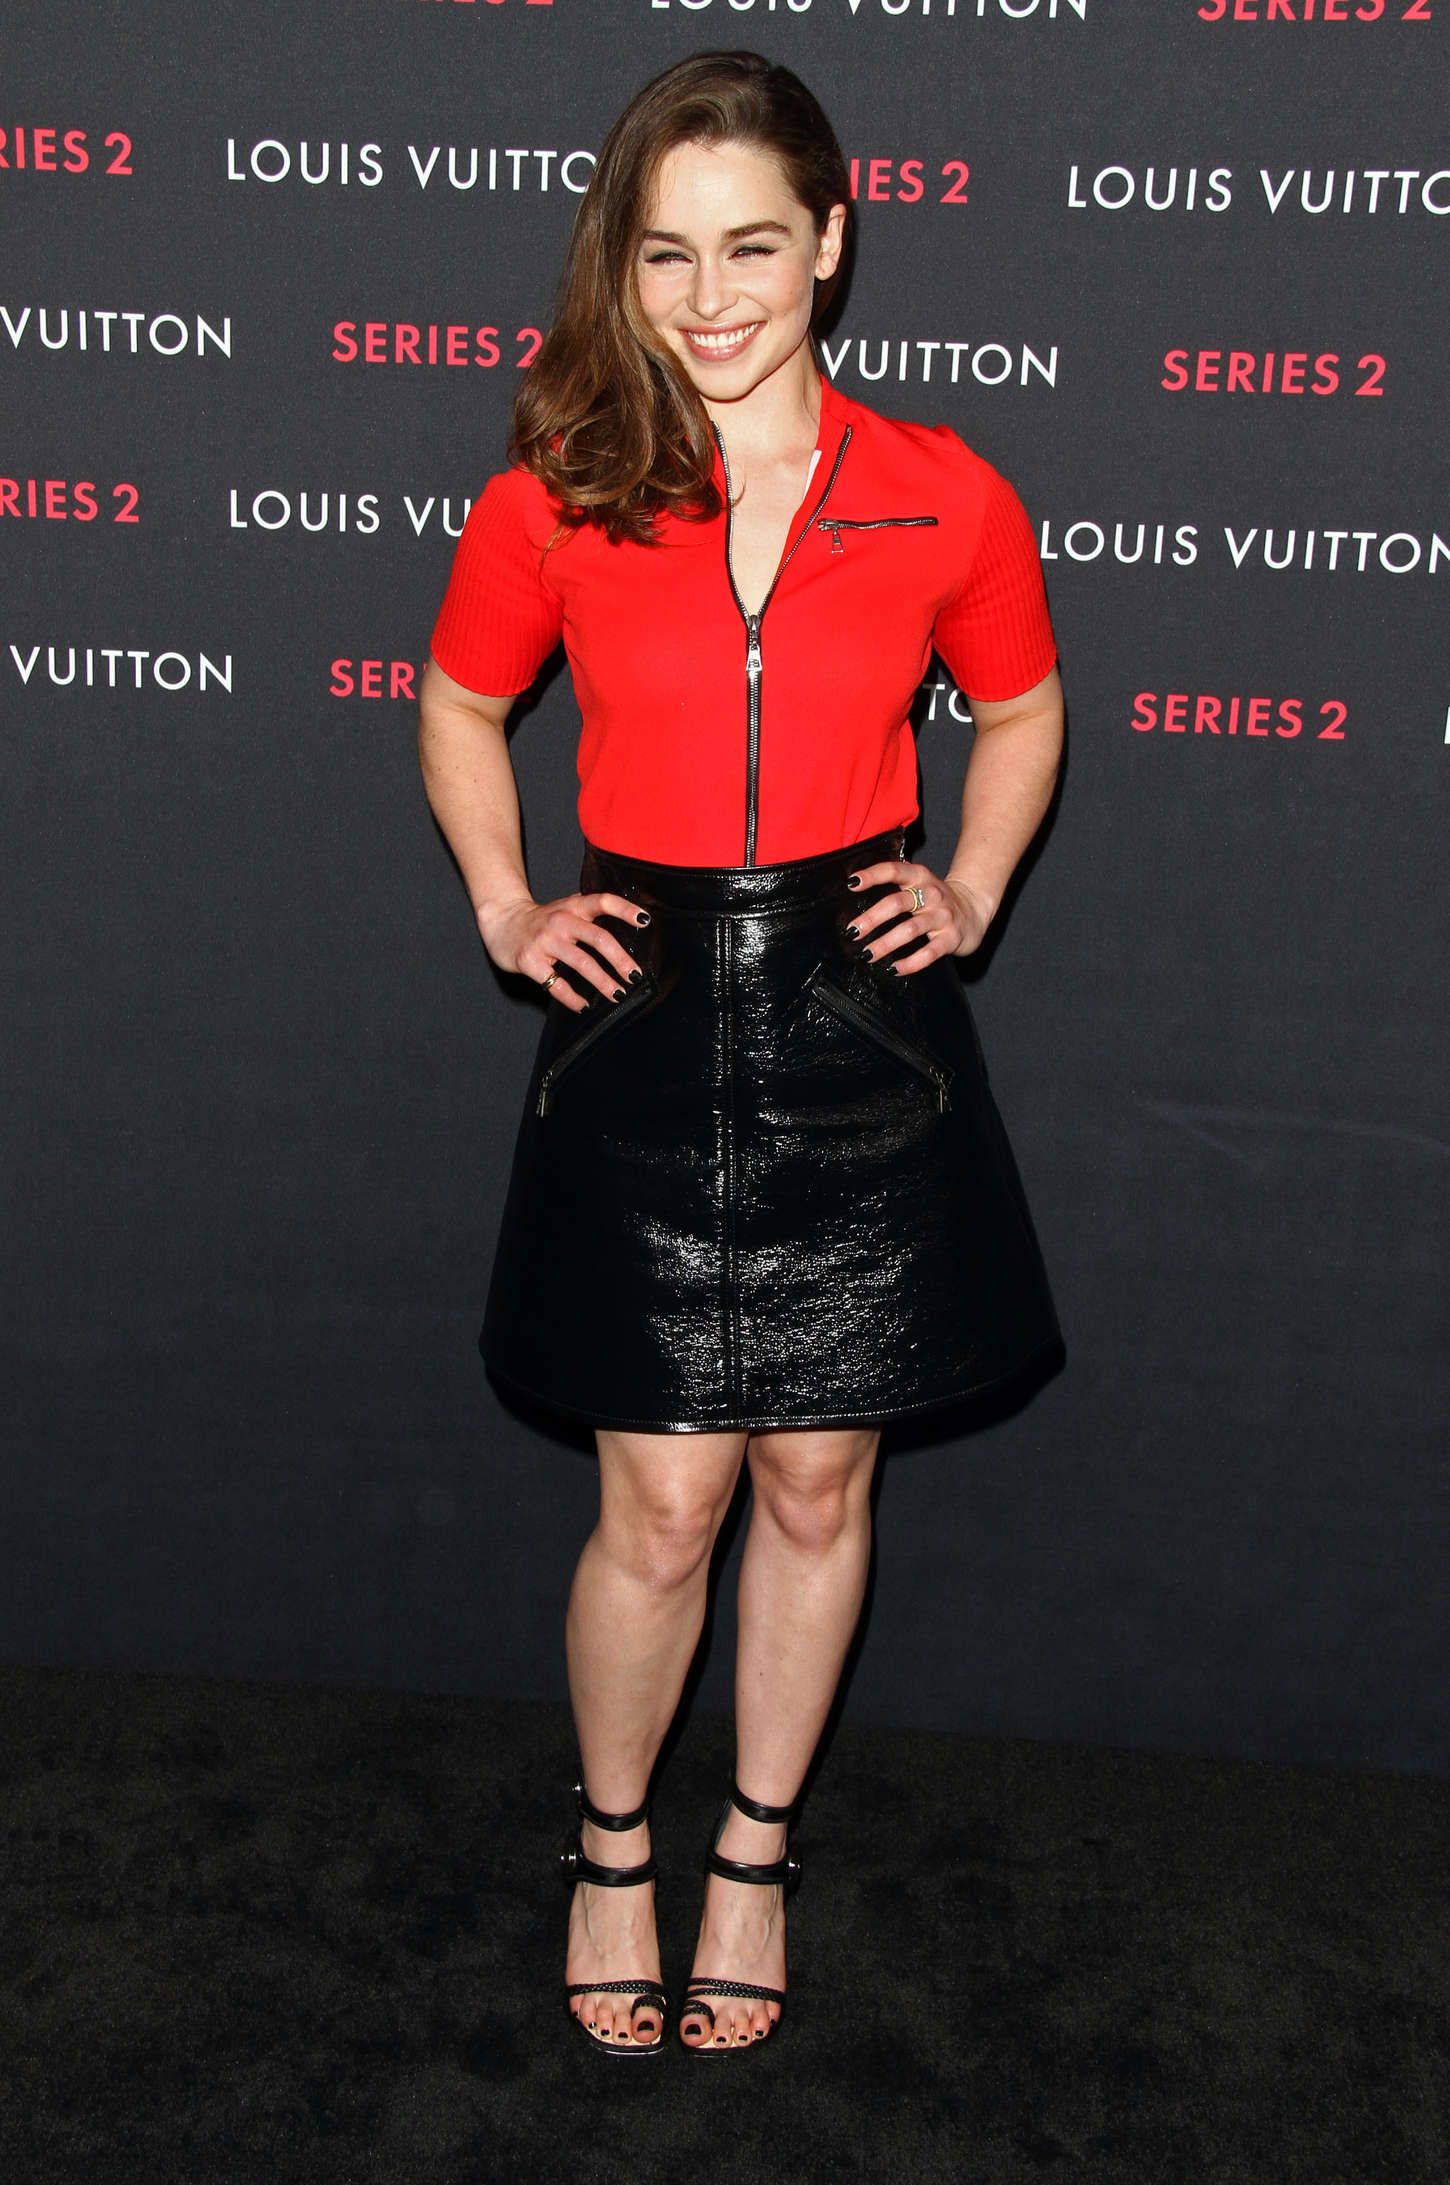 Emilia Clarke 2015 : Emilia Clarke: Louis Vuitton Series 2 The Exhibition -04